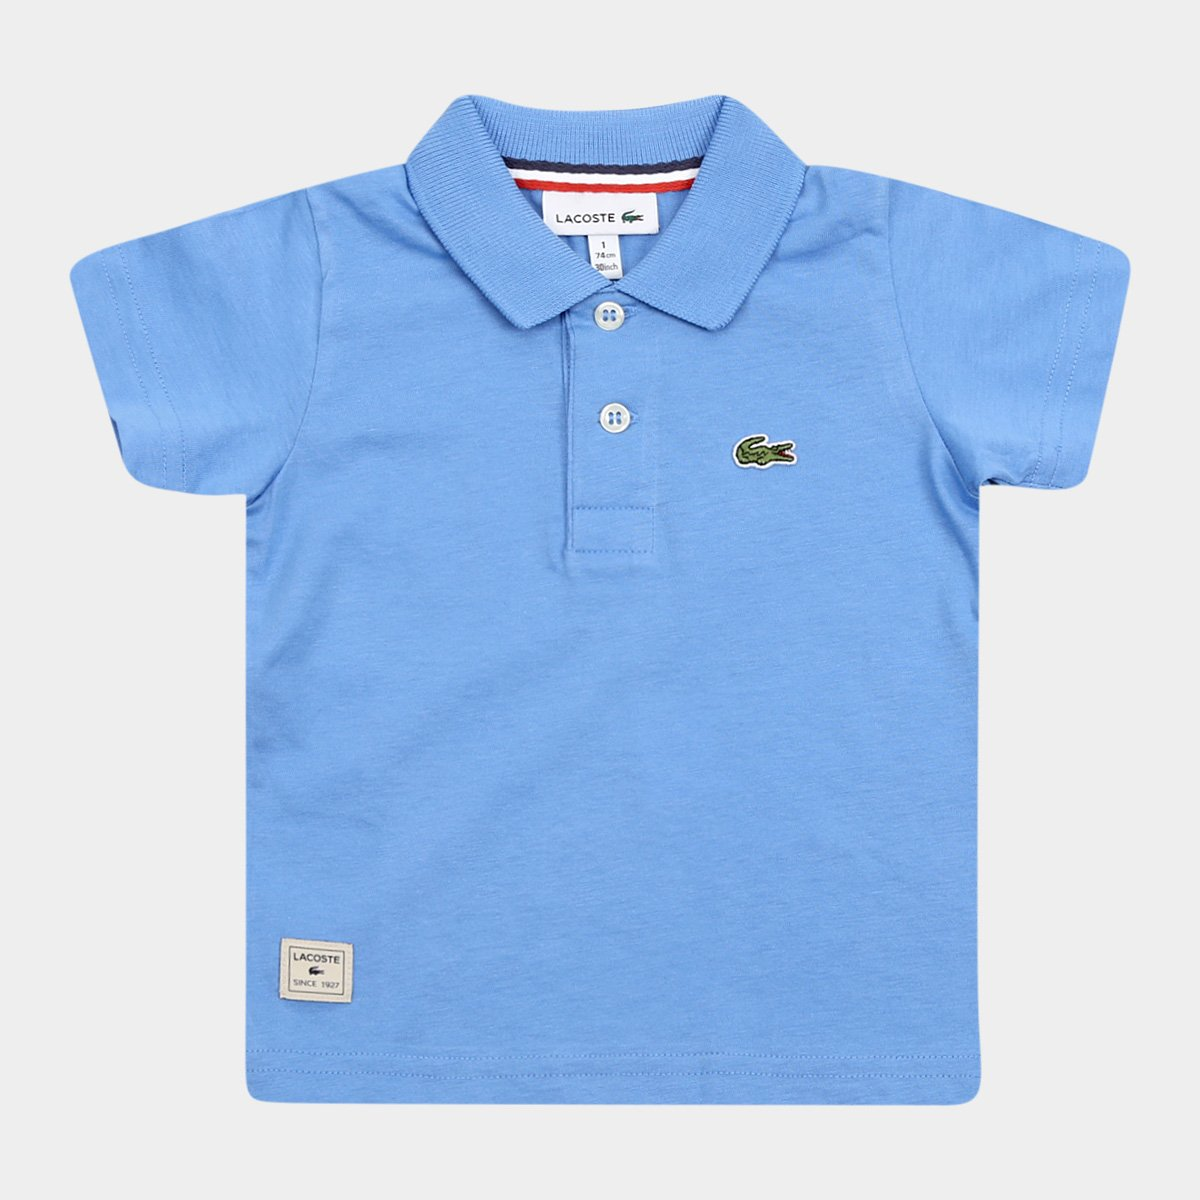 Camisa Polo Infantil Lacoste Masculina - Compre Agora  6329c52d290e7